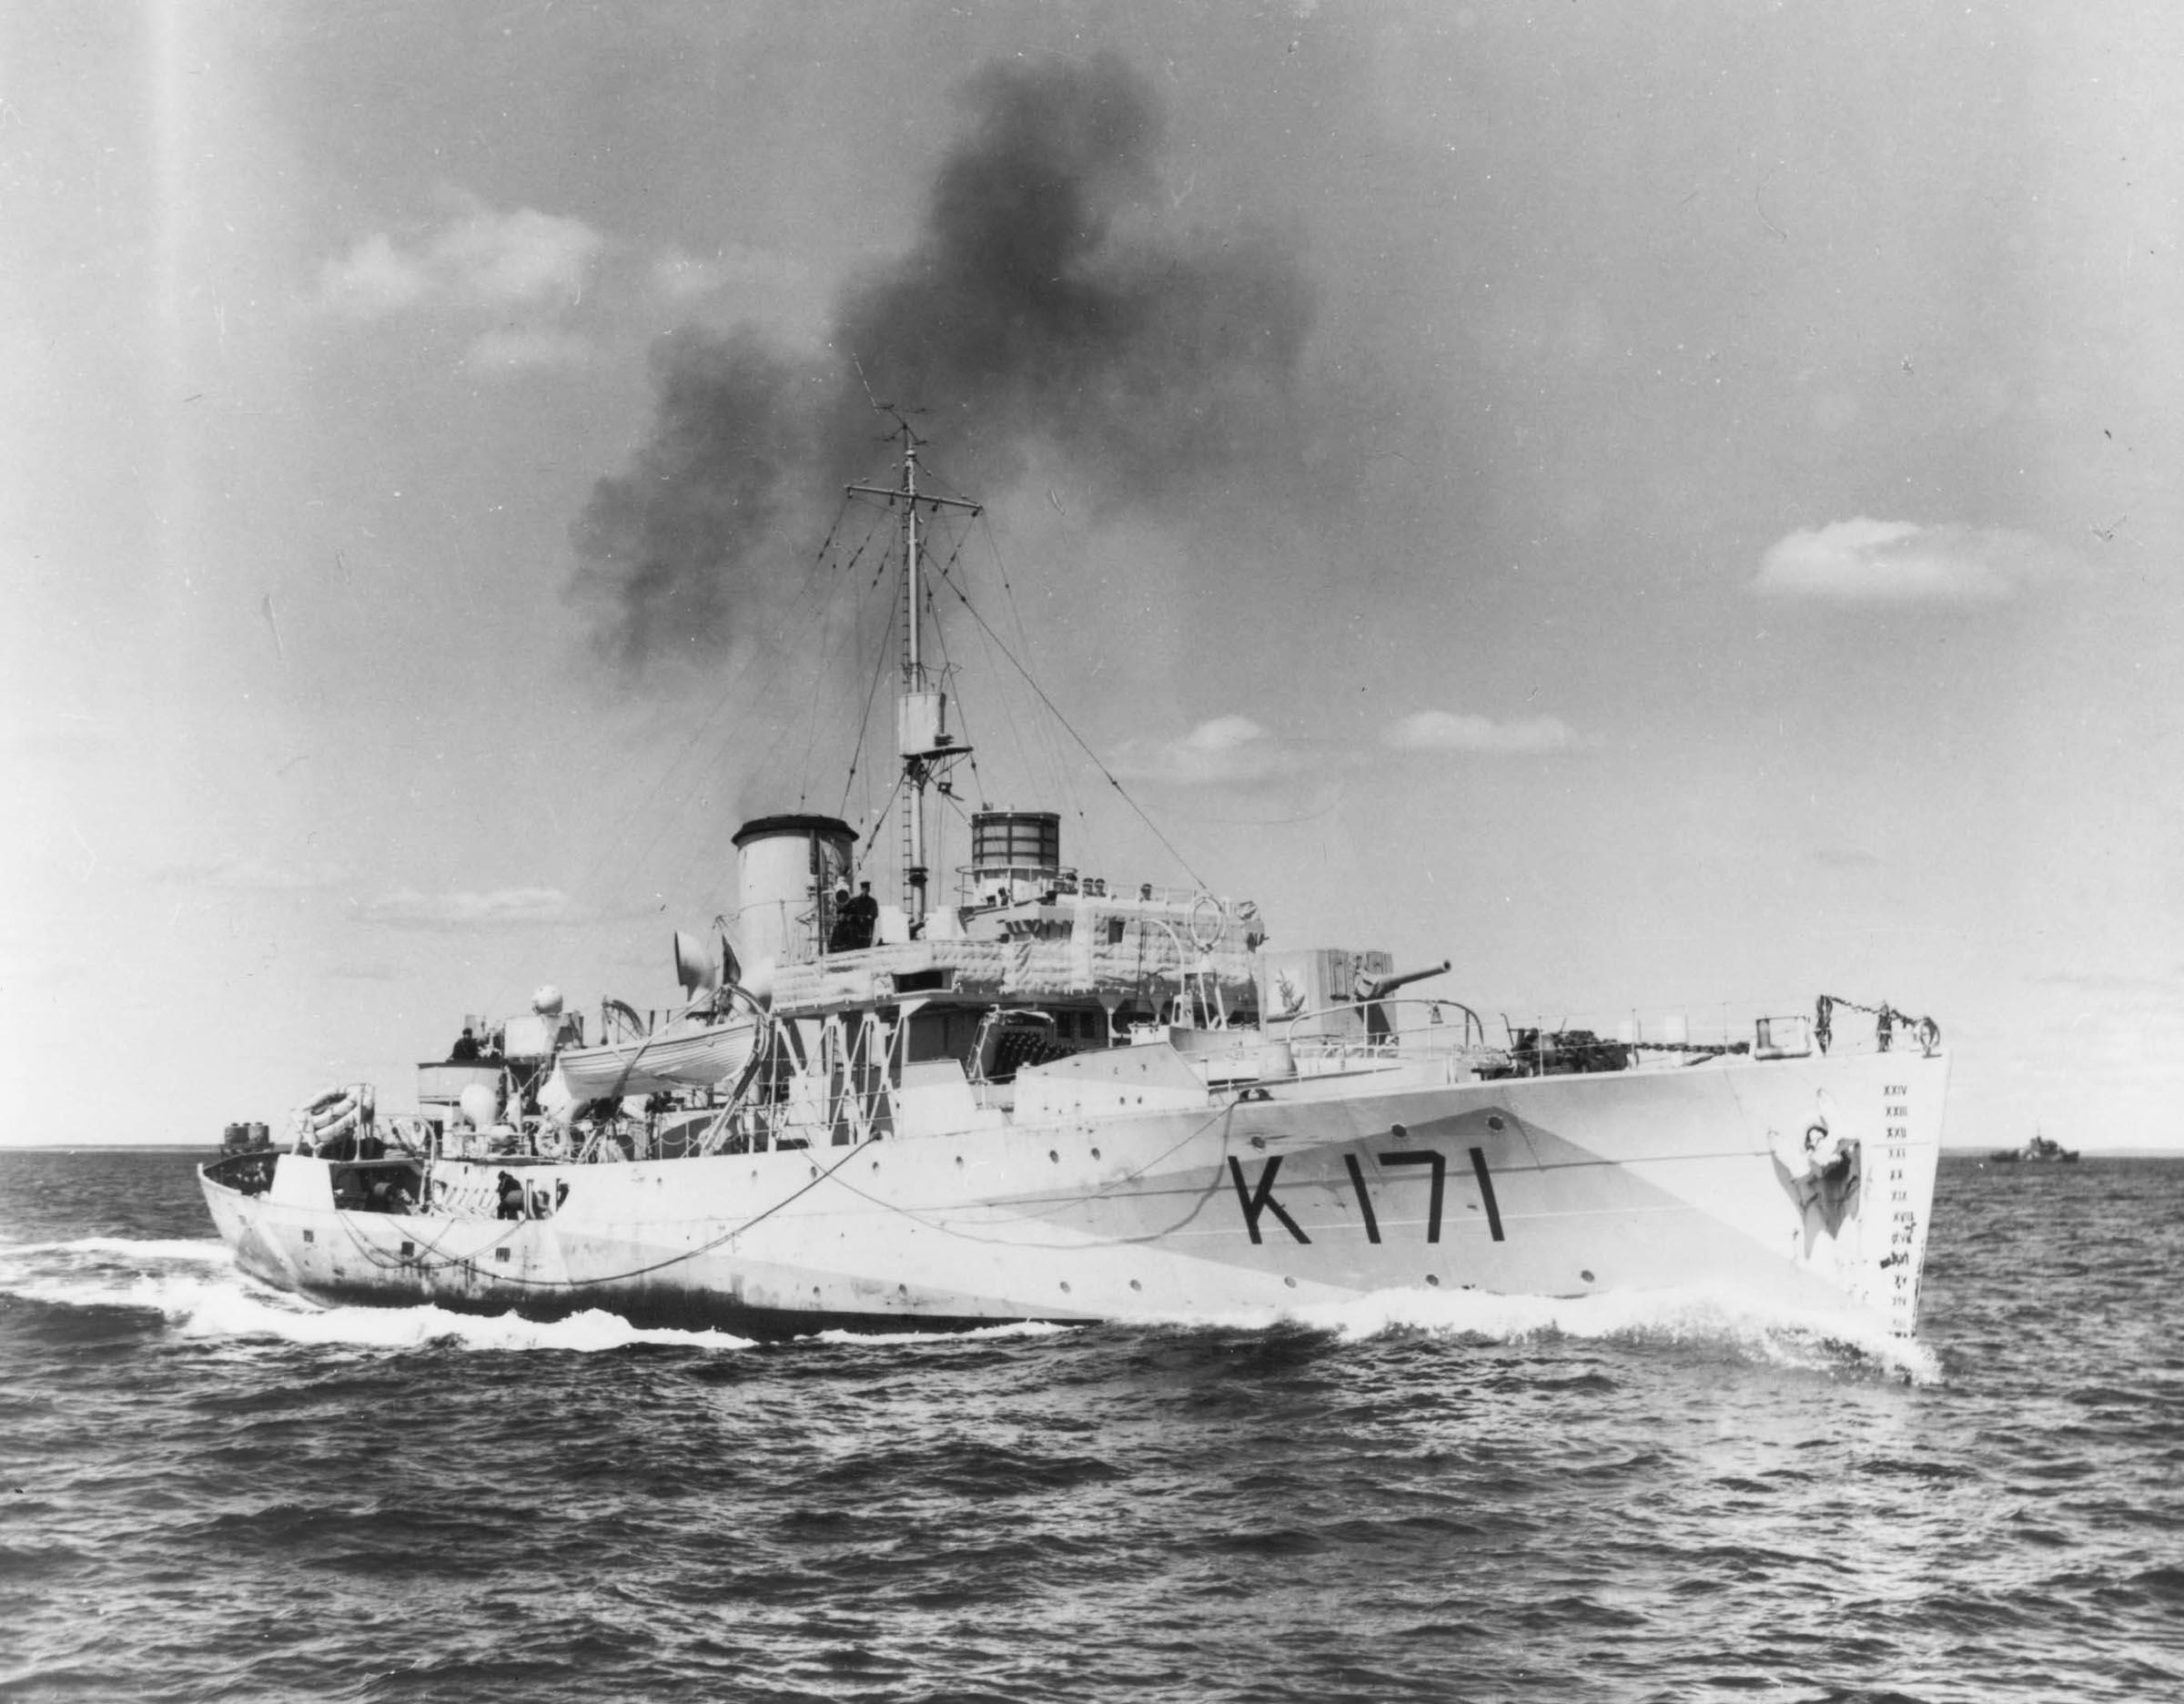 HMCS KAMSACK